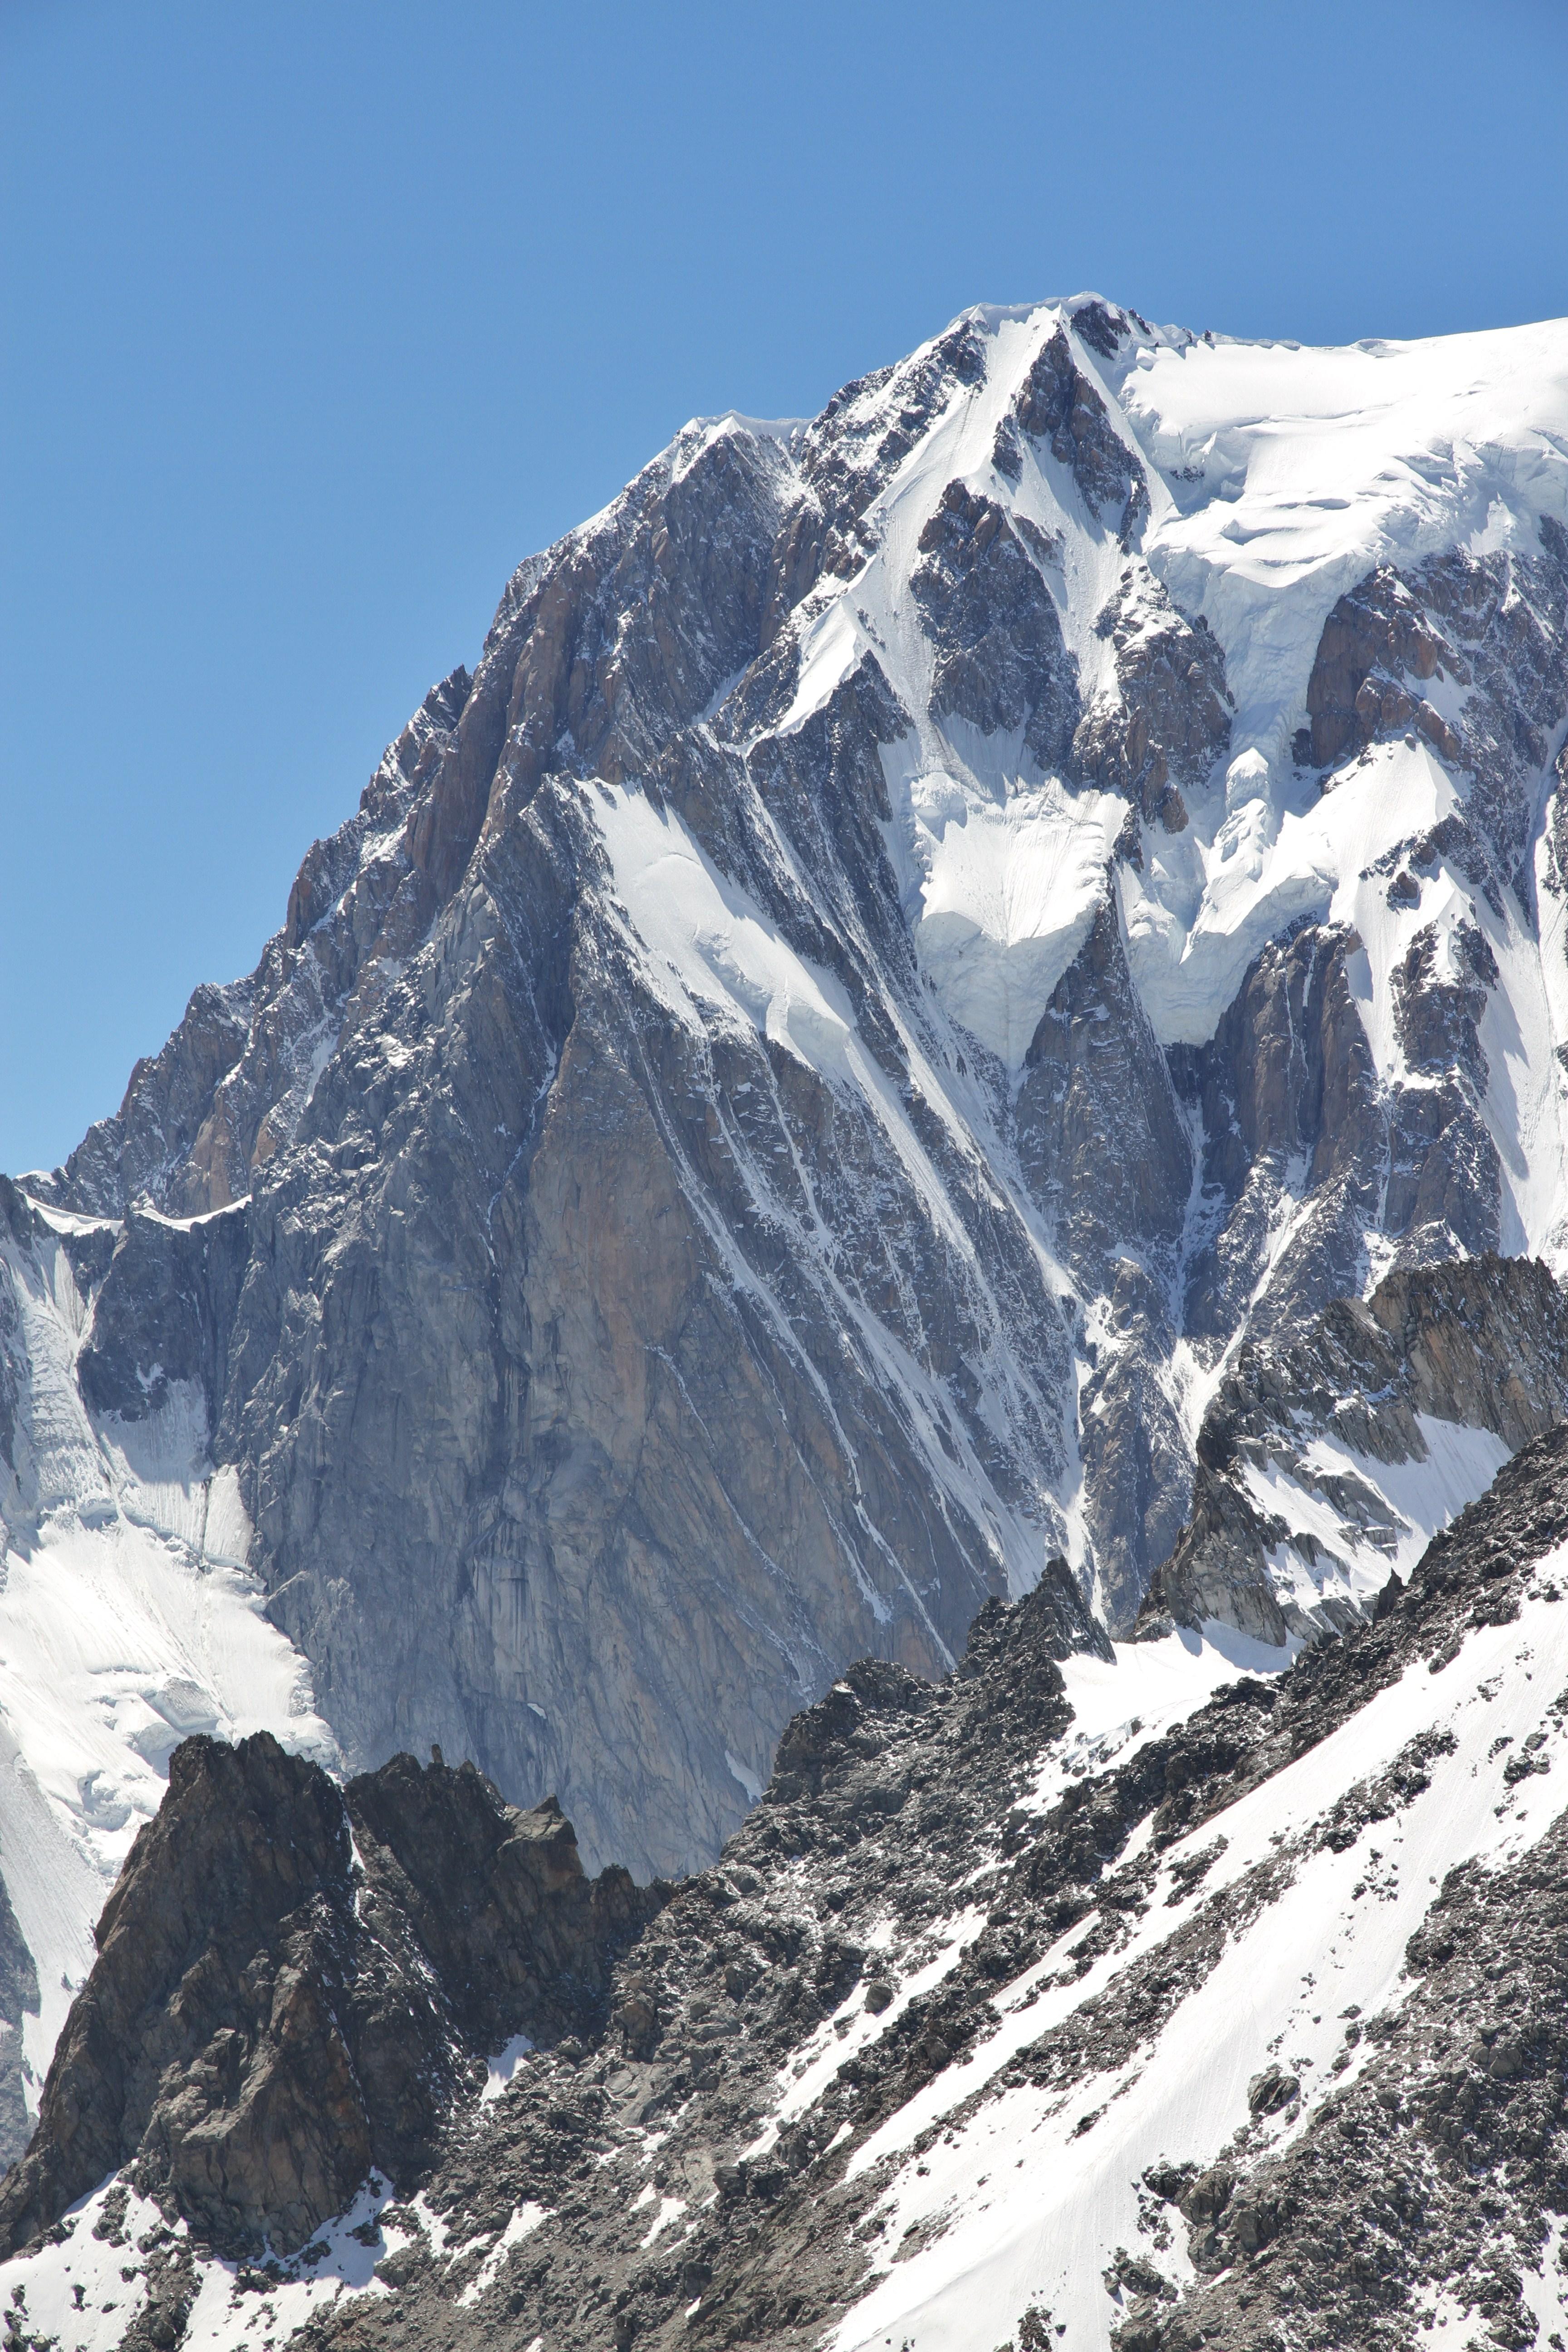 Bertrand e Andrea Di Donato su Divine Providence Mont_Blanc_de_Courmayeur_from_Punta_Helbronner%2C_2010_July_3